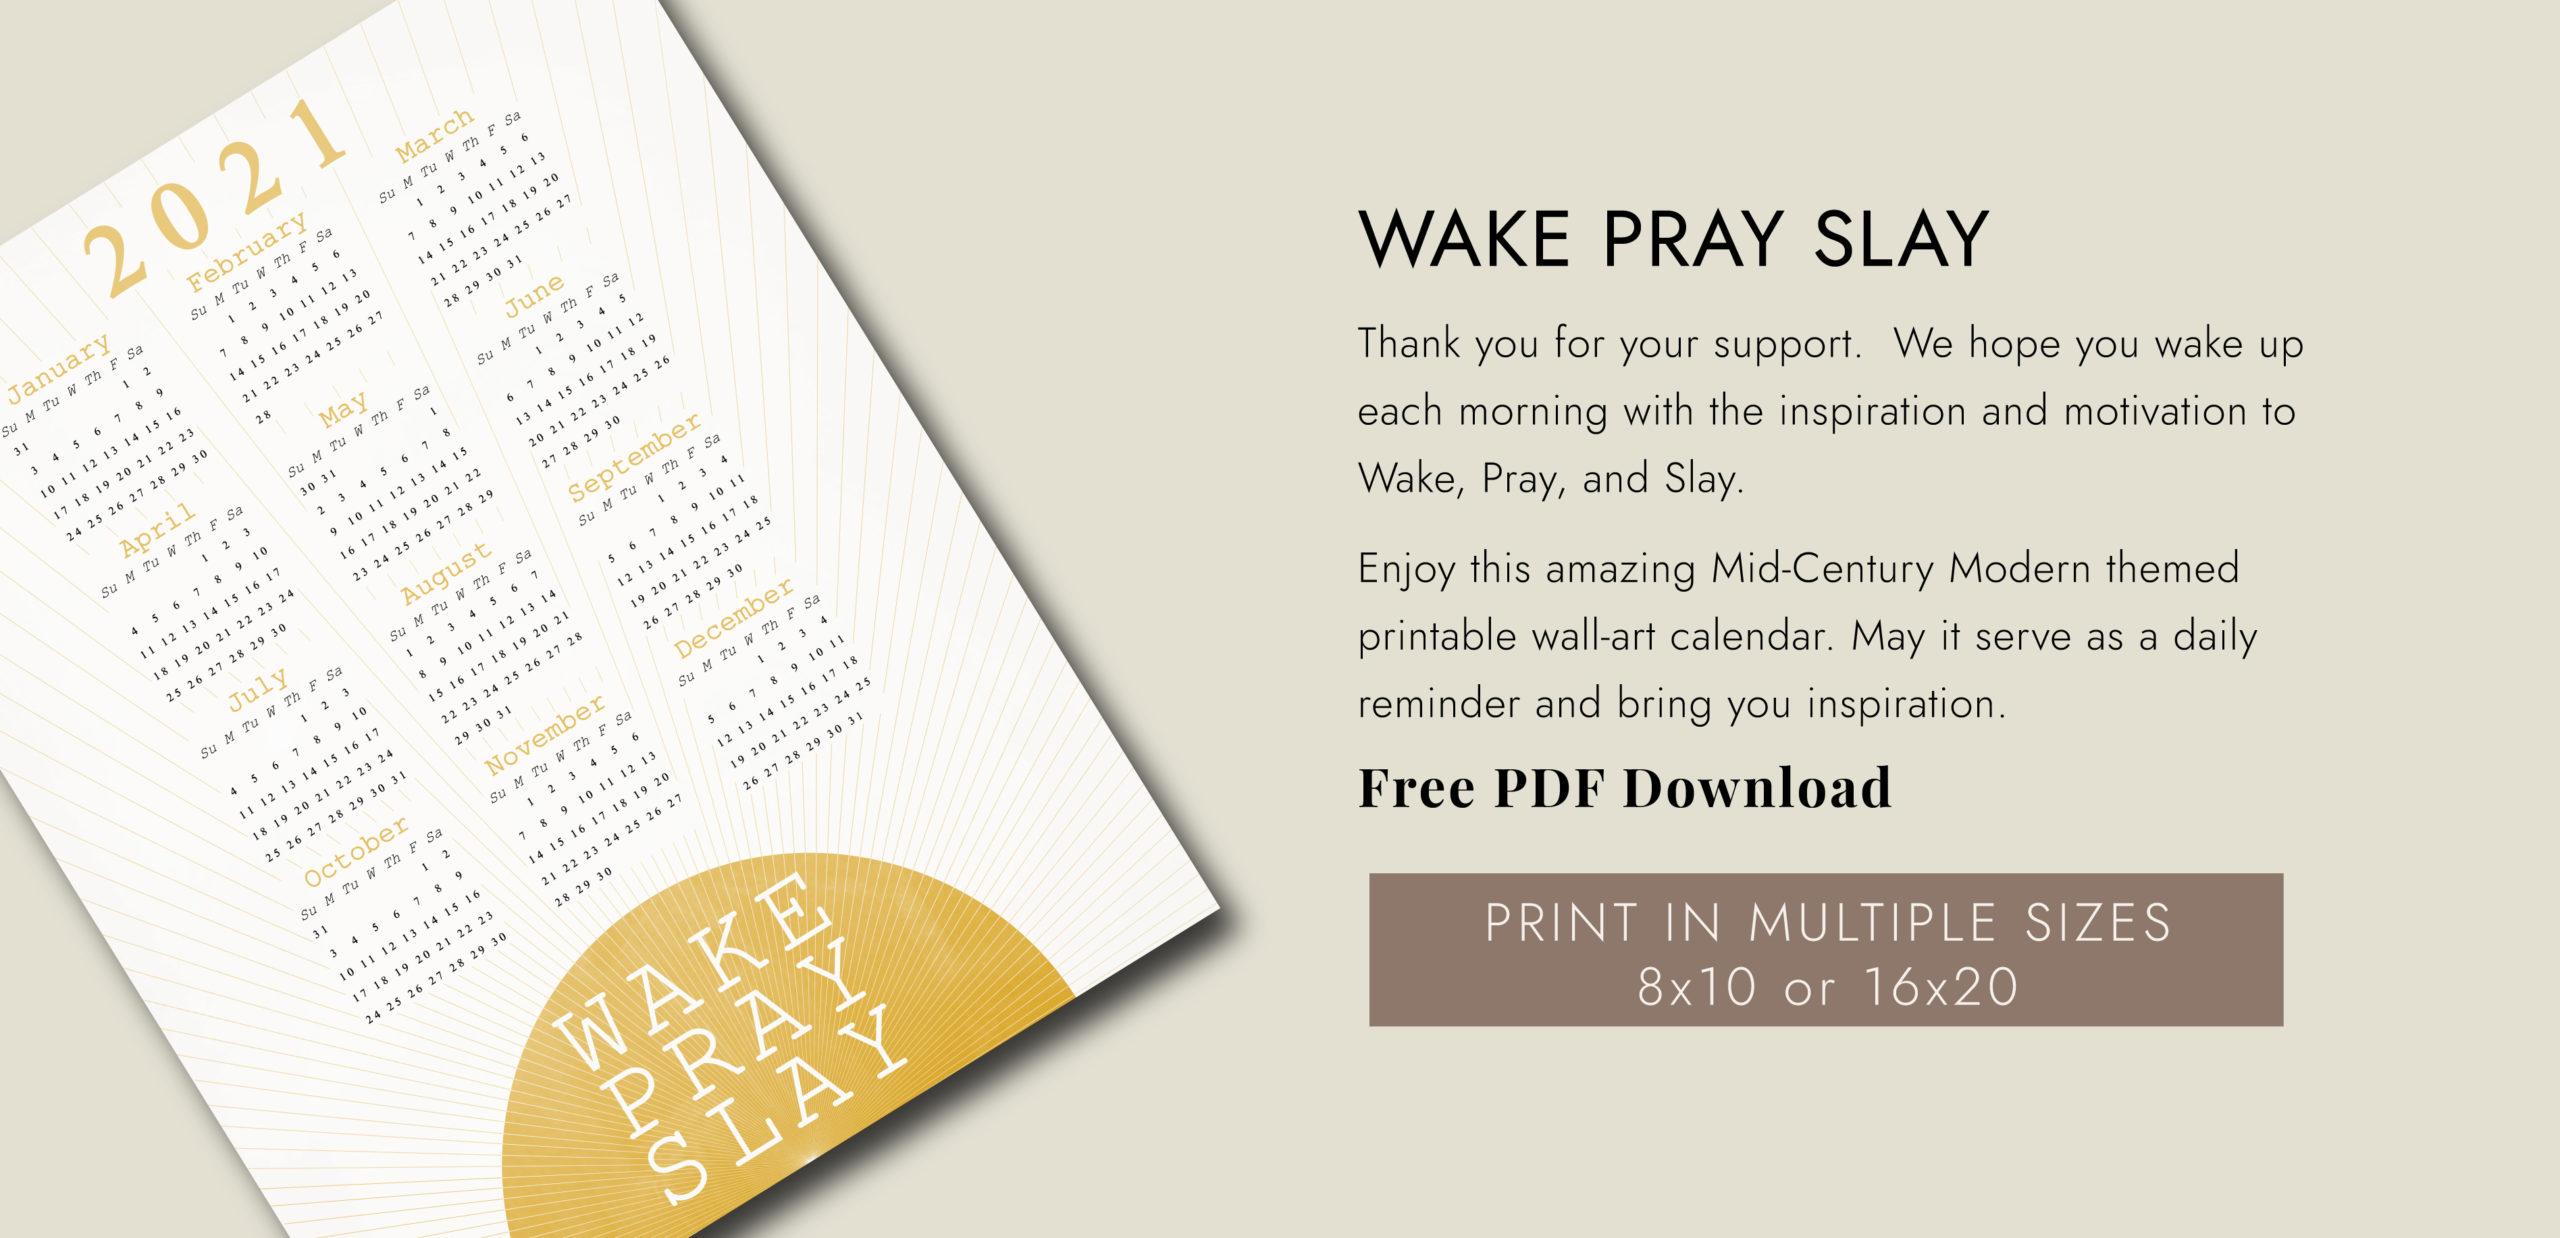 Wake Pray Slay Mid Century Modern Art Free Printable Calendar 2021